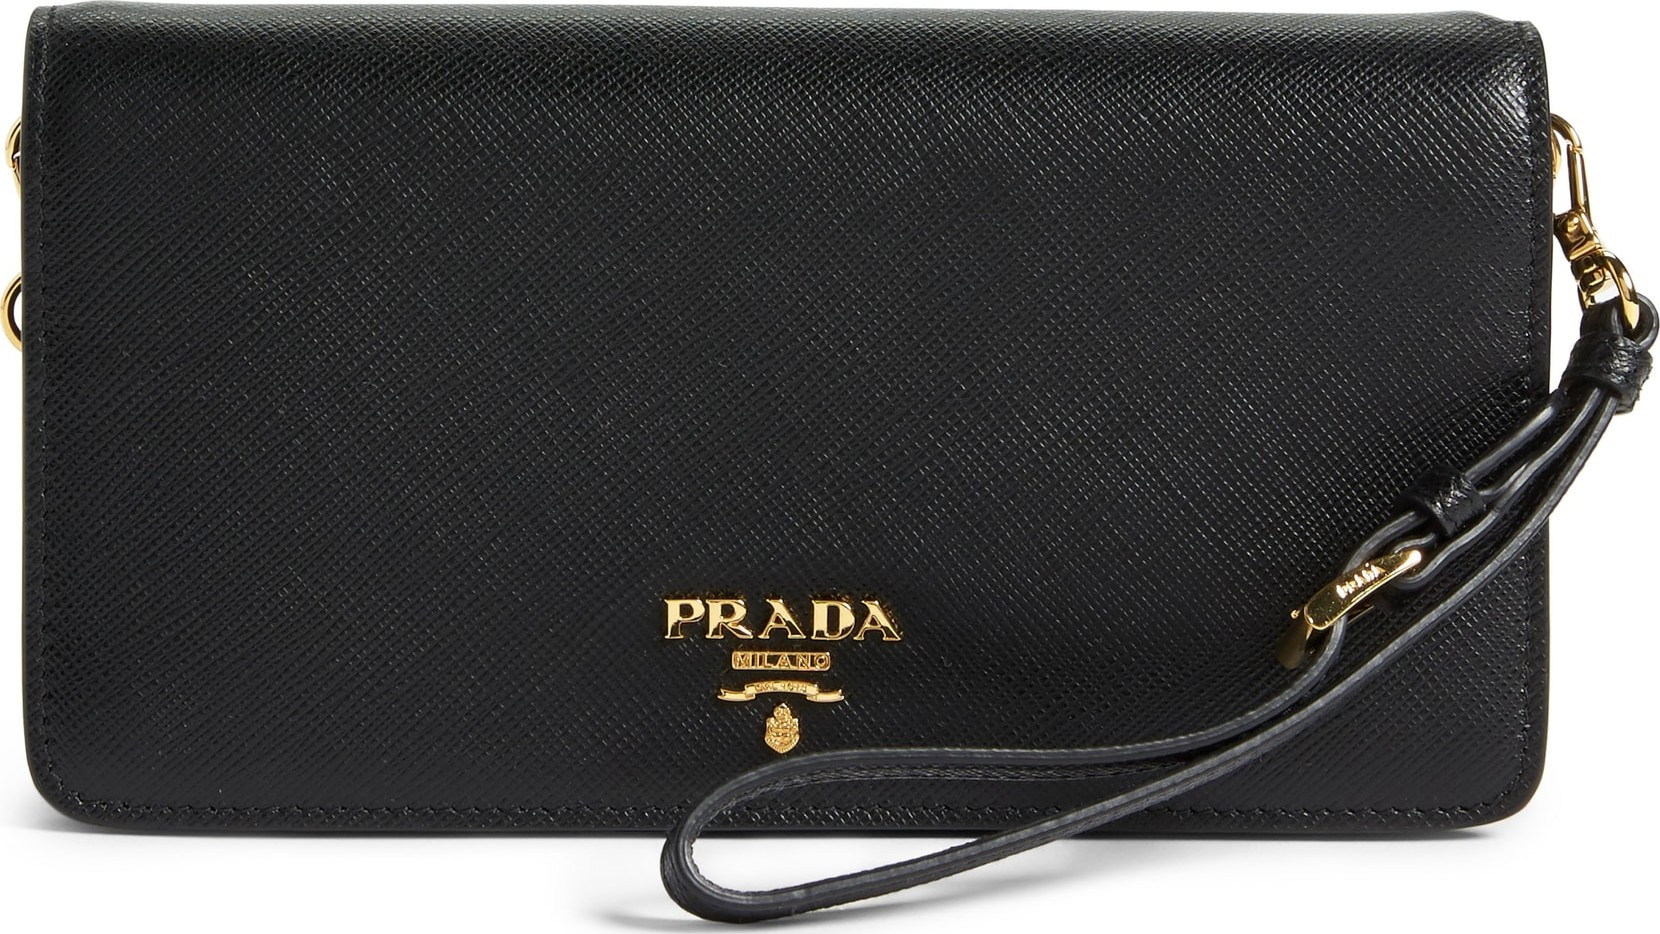 28ab2be7e193 ... uk prada saffiano metal oro flap wallet on a chain 0a56c 4b008 ...